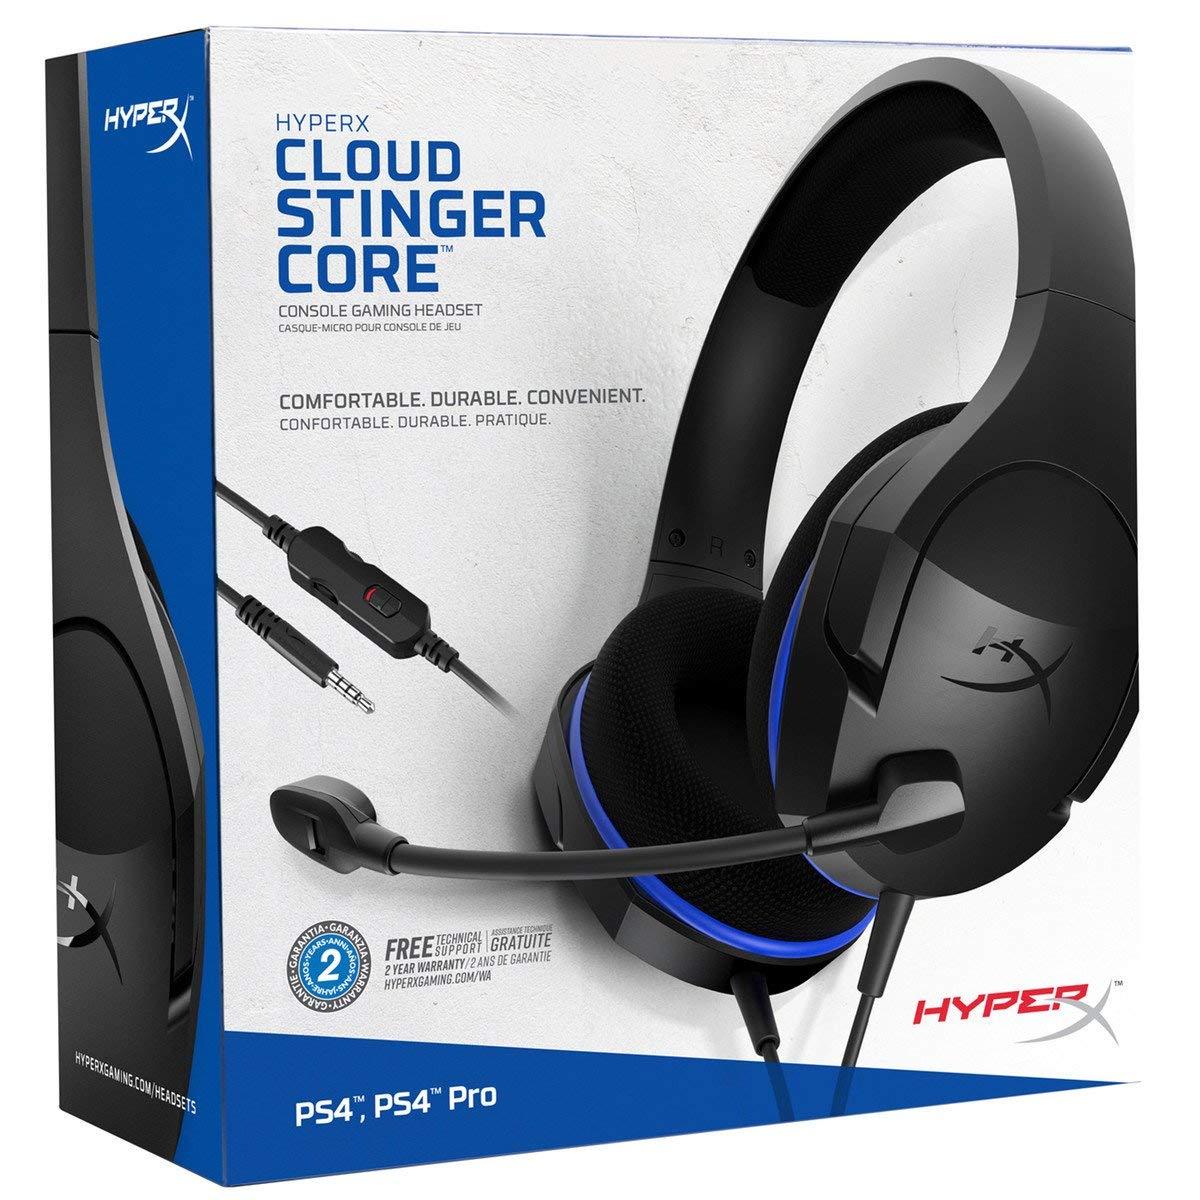 [saturn / amazon / Media Markt] Kingston HyperX Cloud Stinger Core - Over-Ear Kopfhörer (PS4 & PS4 Pro, Xbox One, Nintendo Switch)